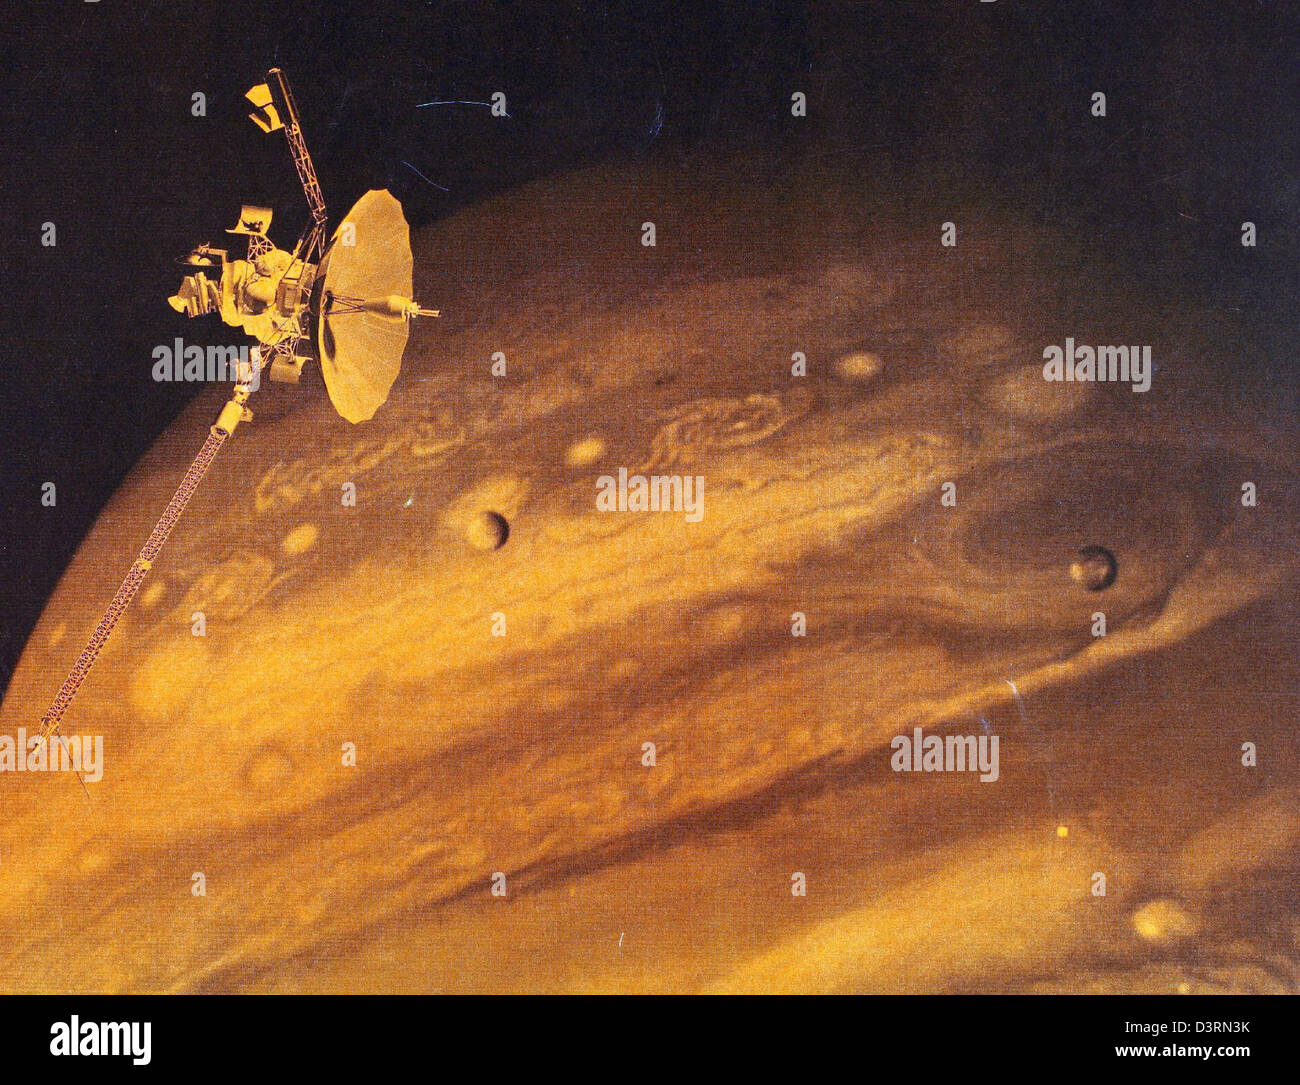 nasa galileo mission - 750×574